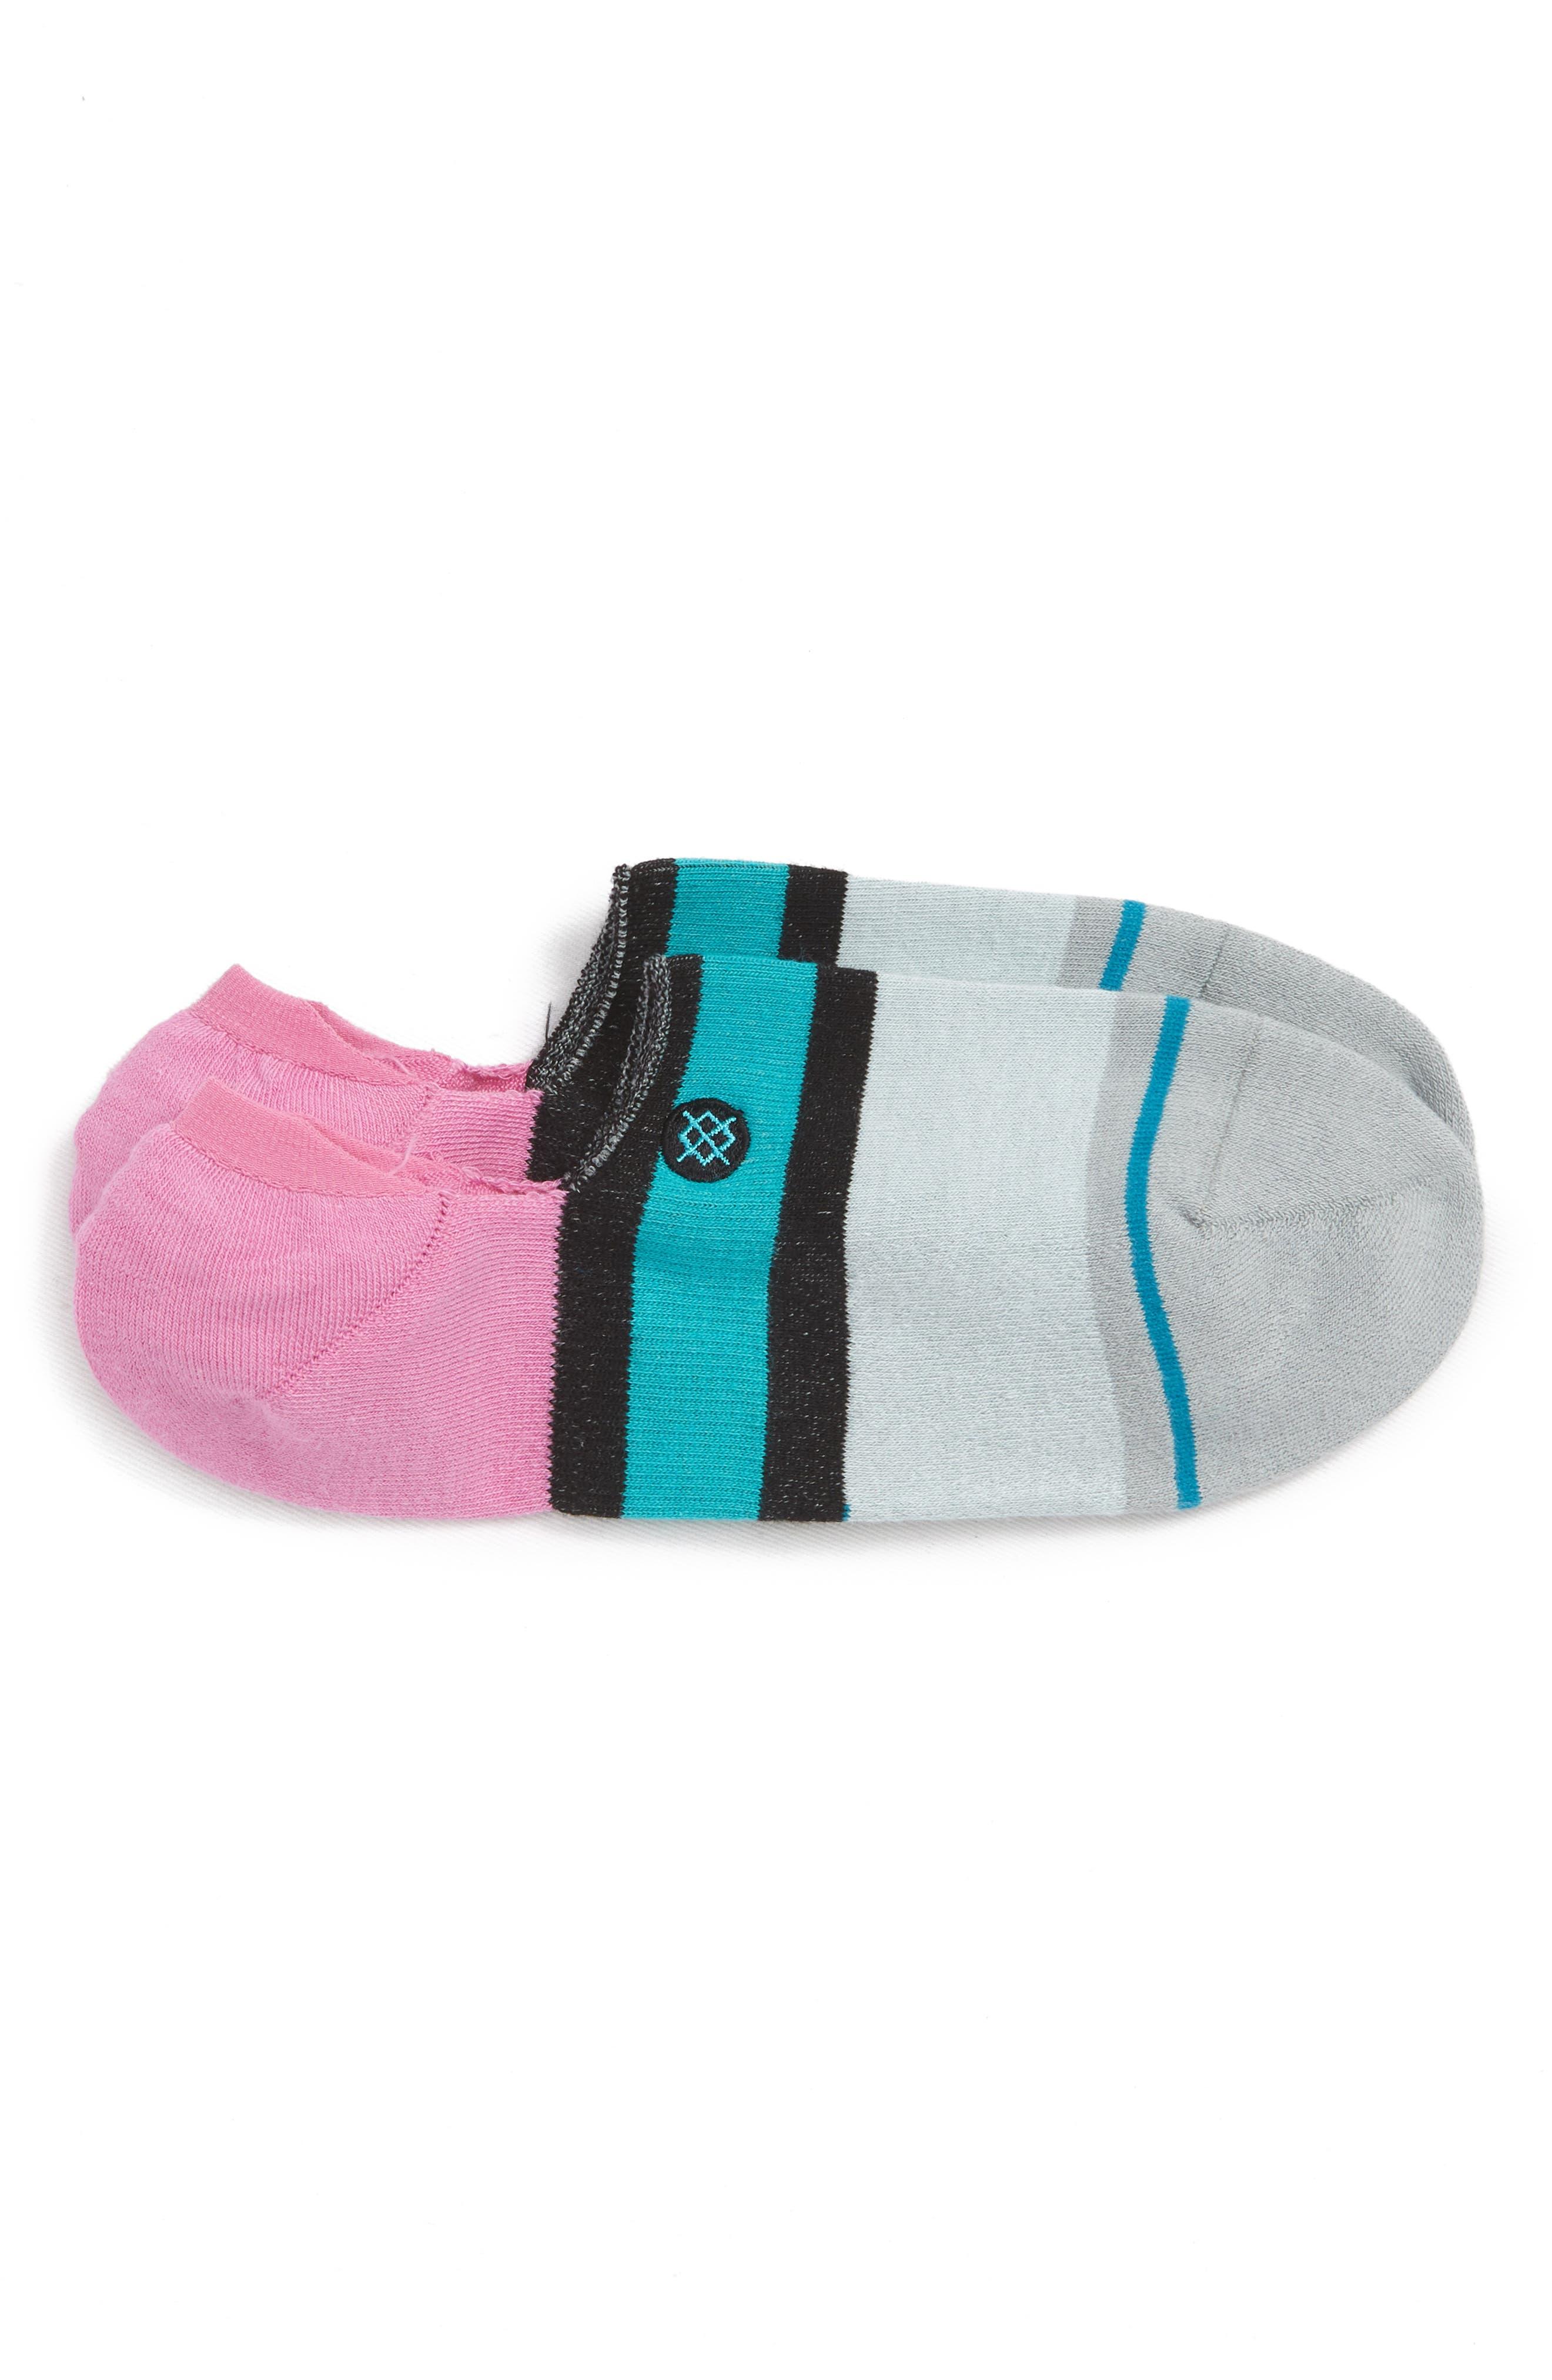 Stance Abbot No-Show Socks